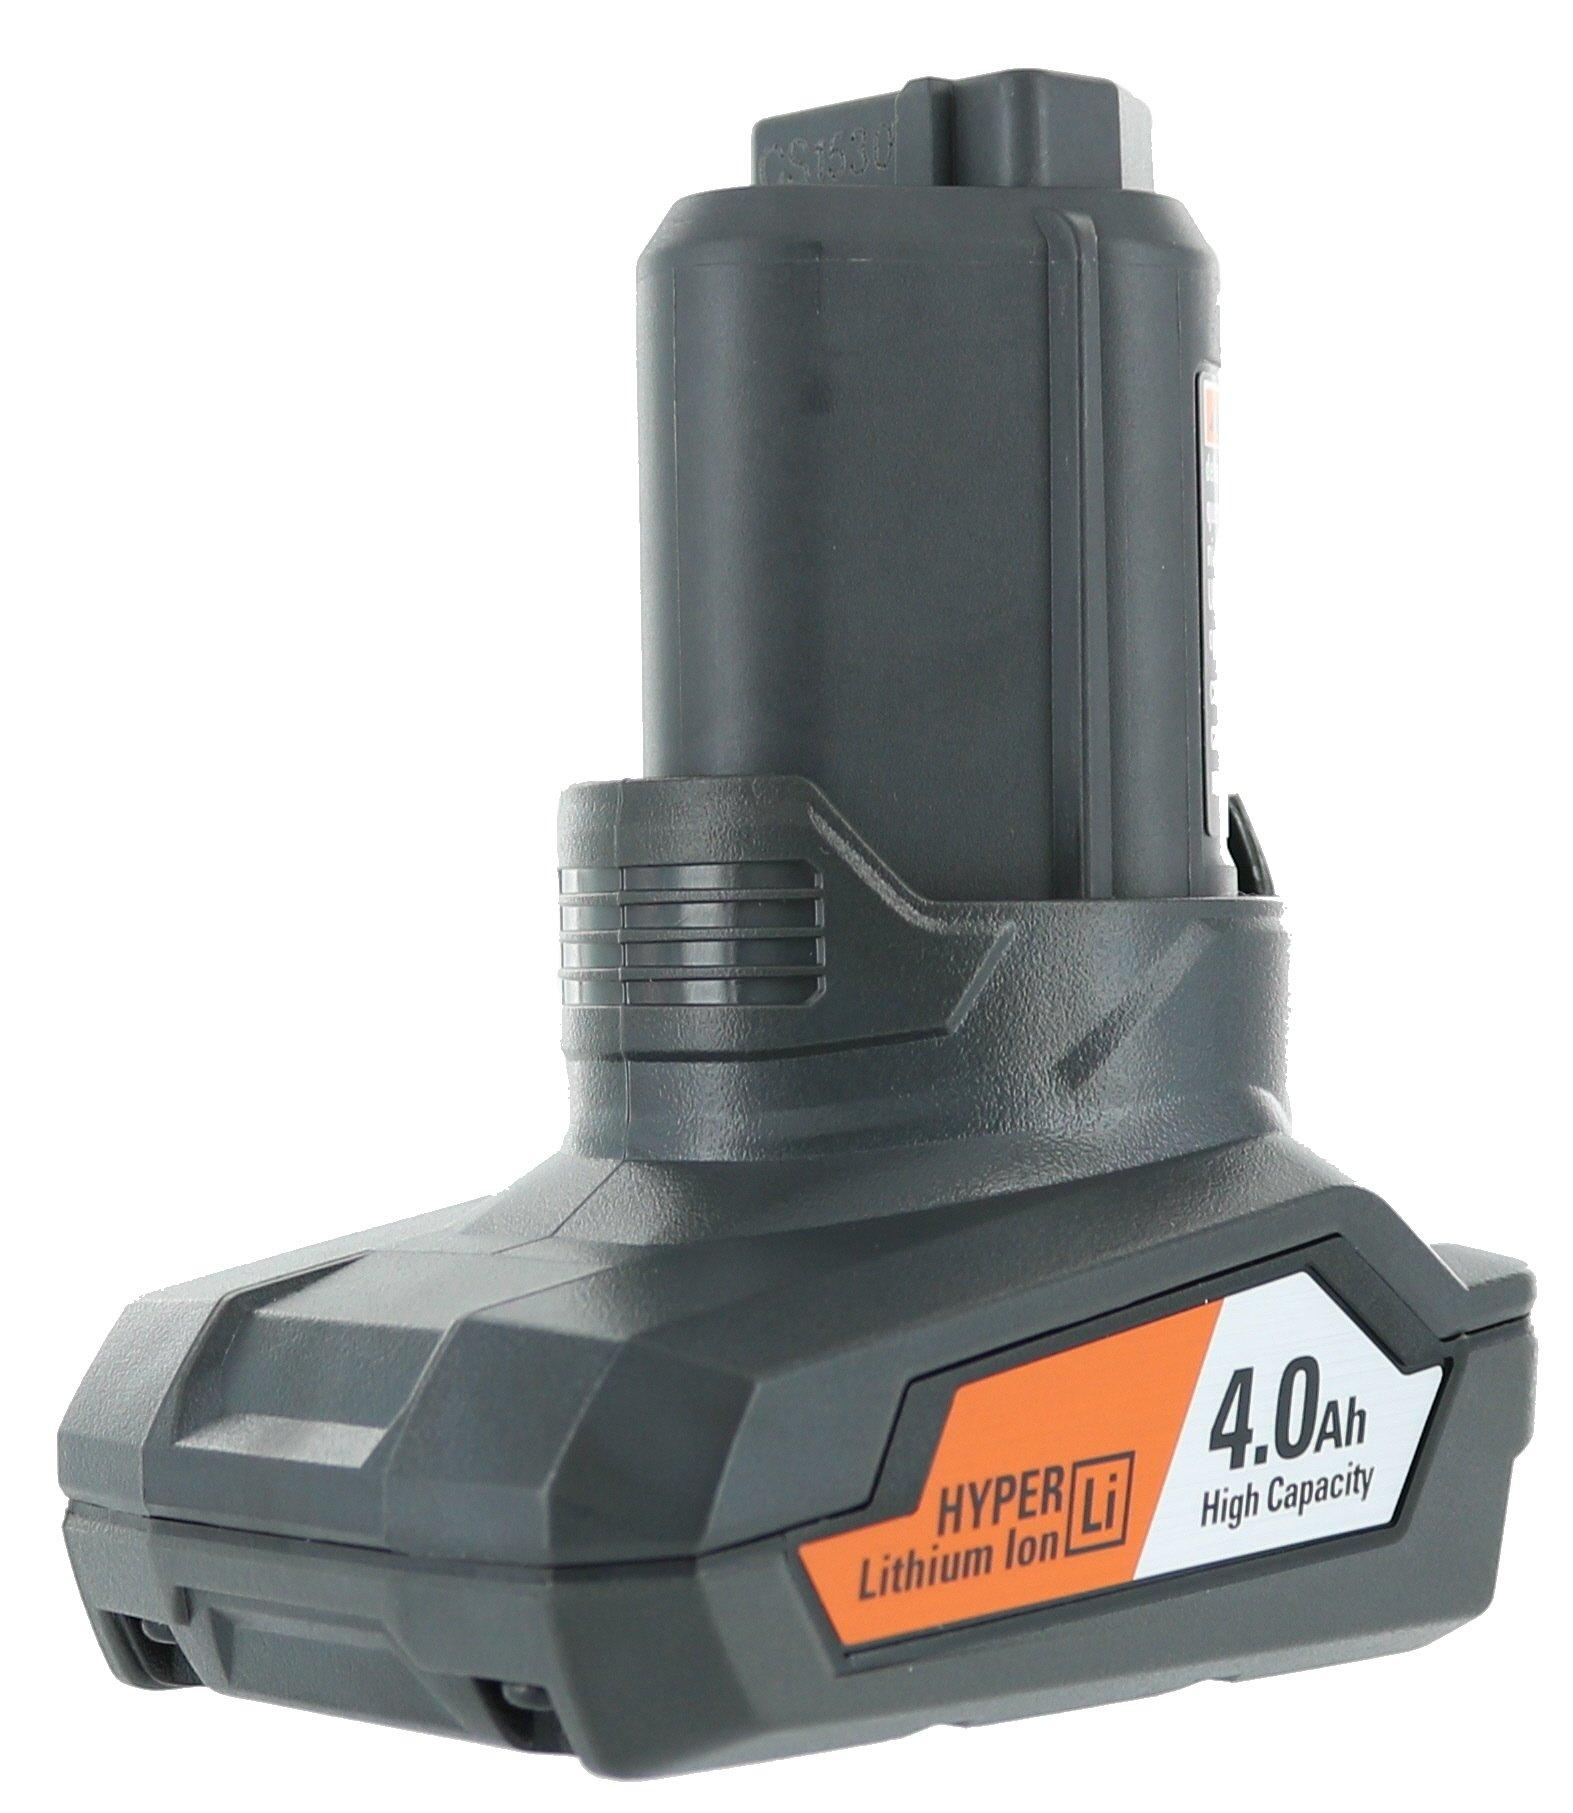 71Ig8BD3MuL._SR500500_ battery ridgid 12v amazon com